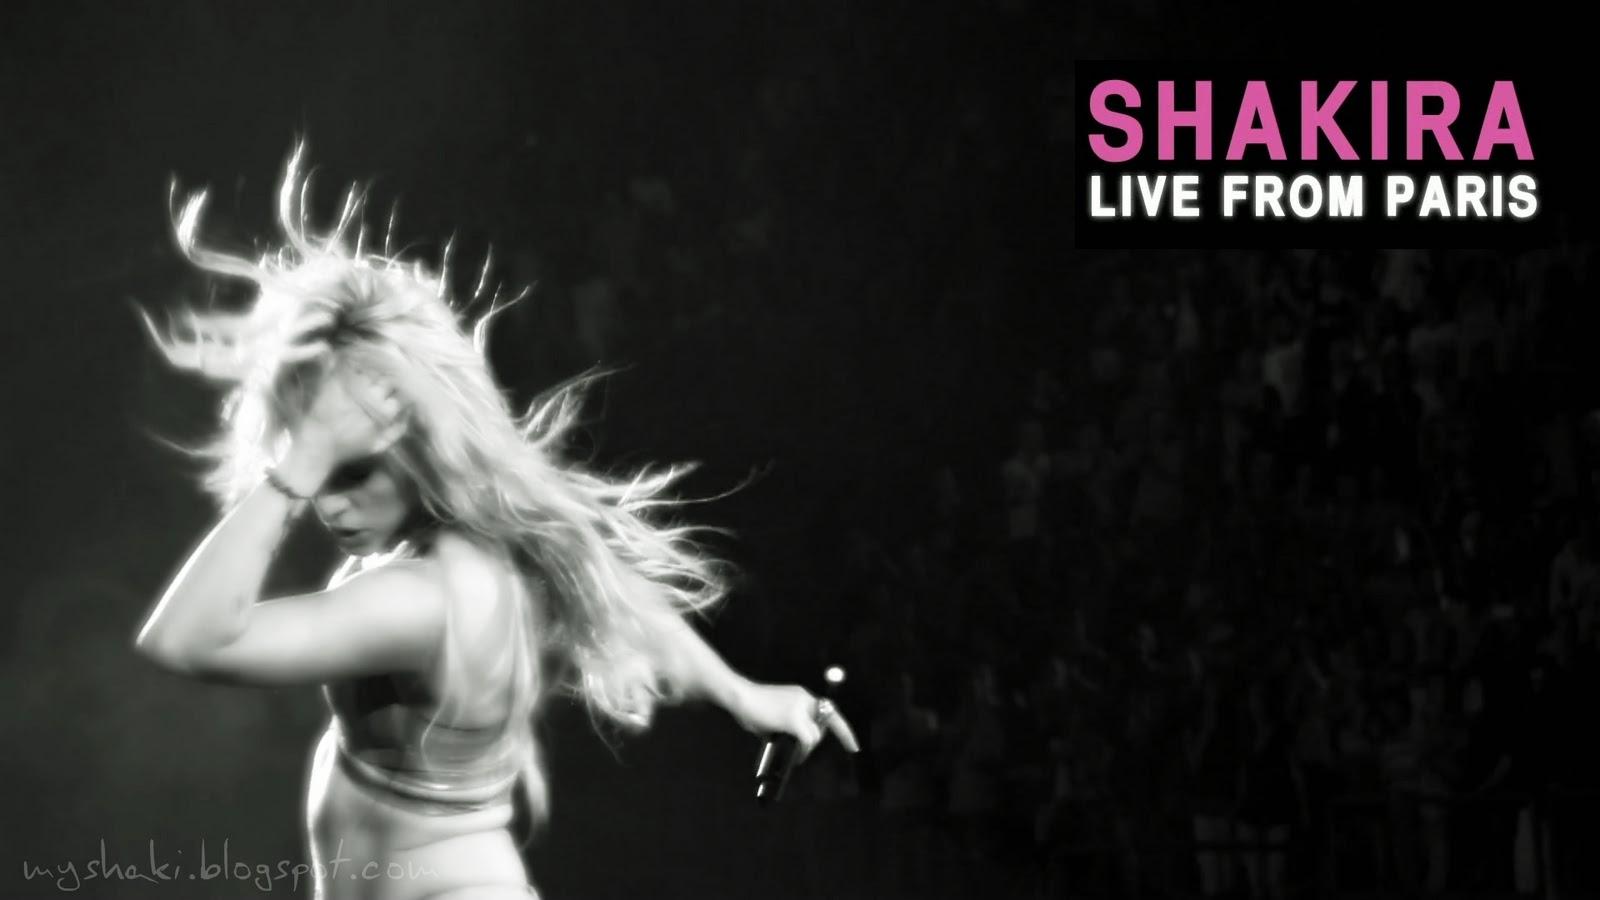 http://2.bp.blogspot.com/-otK63MxeB38/TstSRPdVnvI/AAAAAAAAJtA/FAVUXjTSPkk/s1600/Shakira-Live+From+Paris+DVD+++wallpaper+%25281%2529.jpg